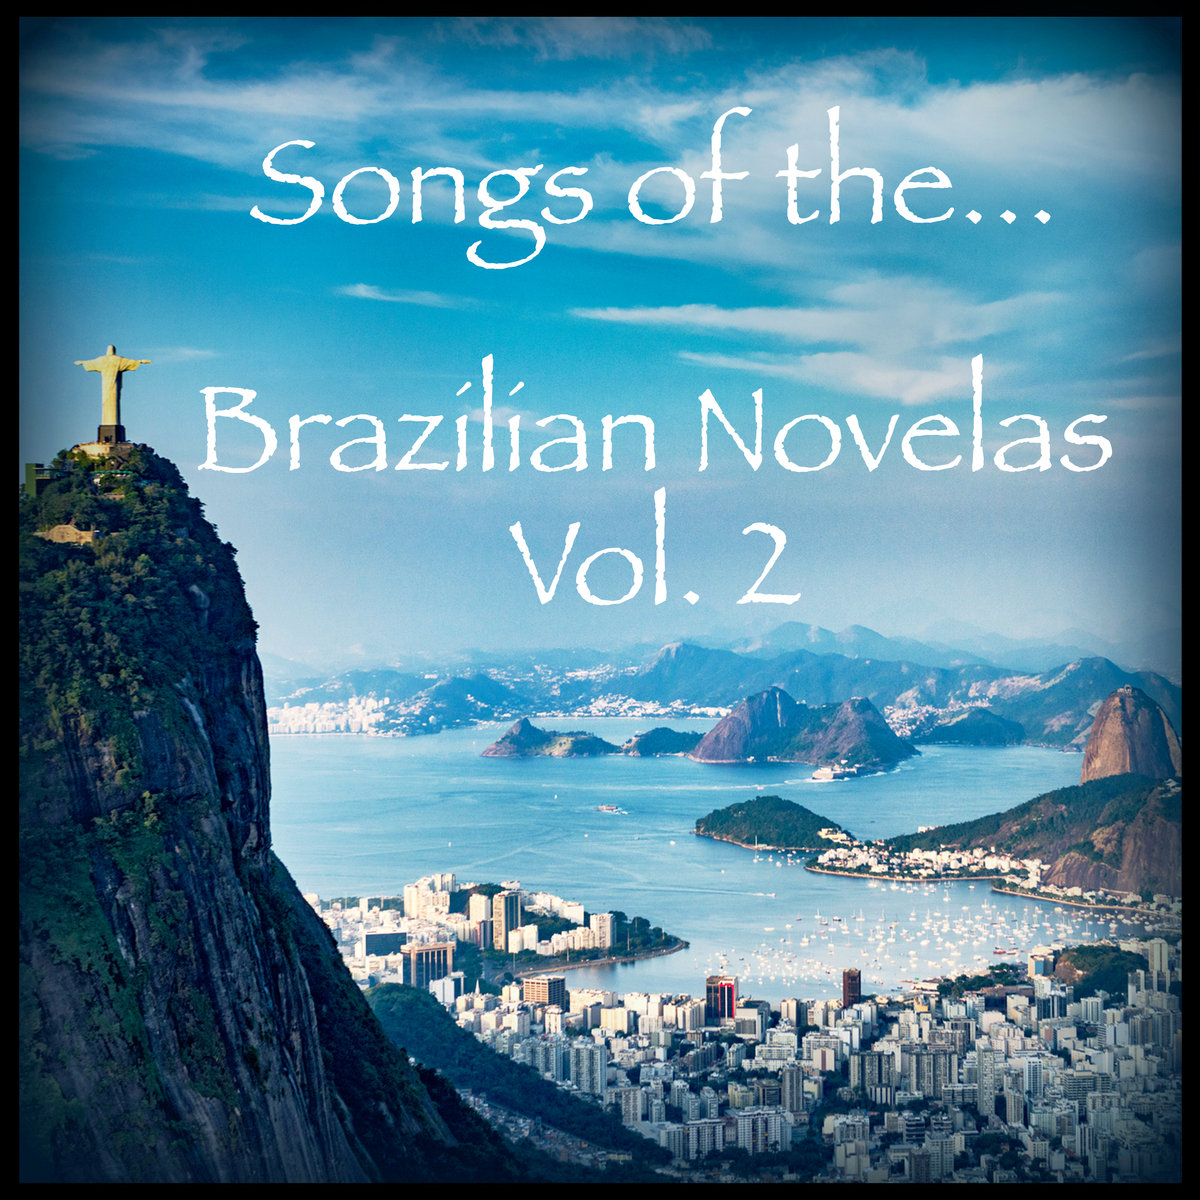 Songs of the Brazilian Novelas Vol  2 | Heavy Hitters Music